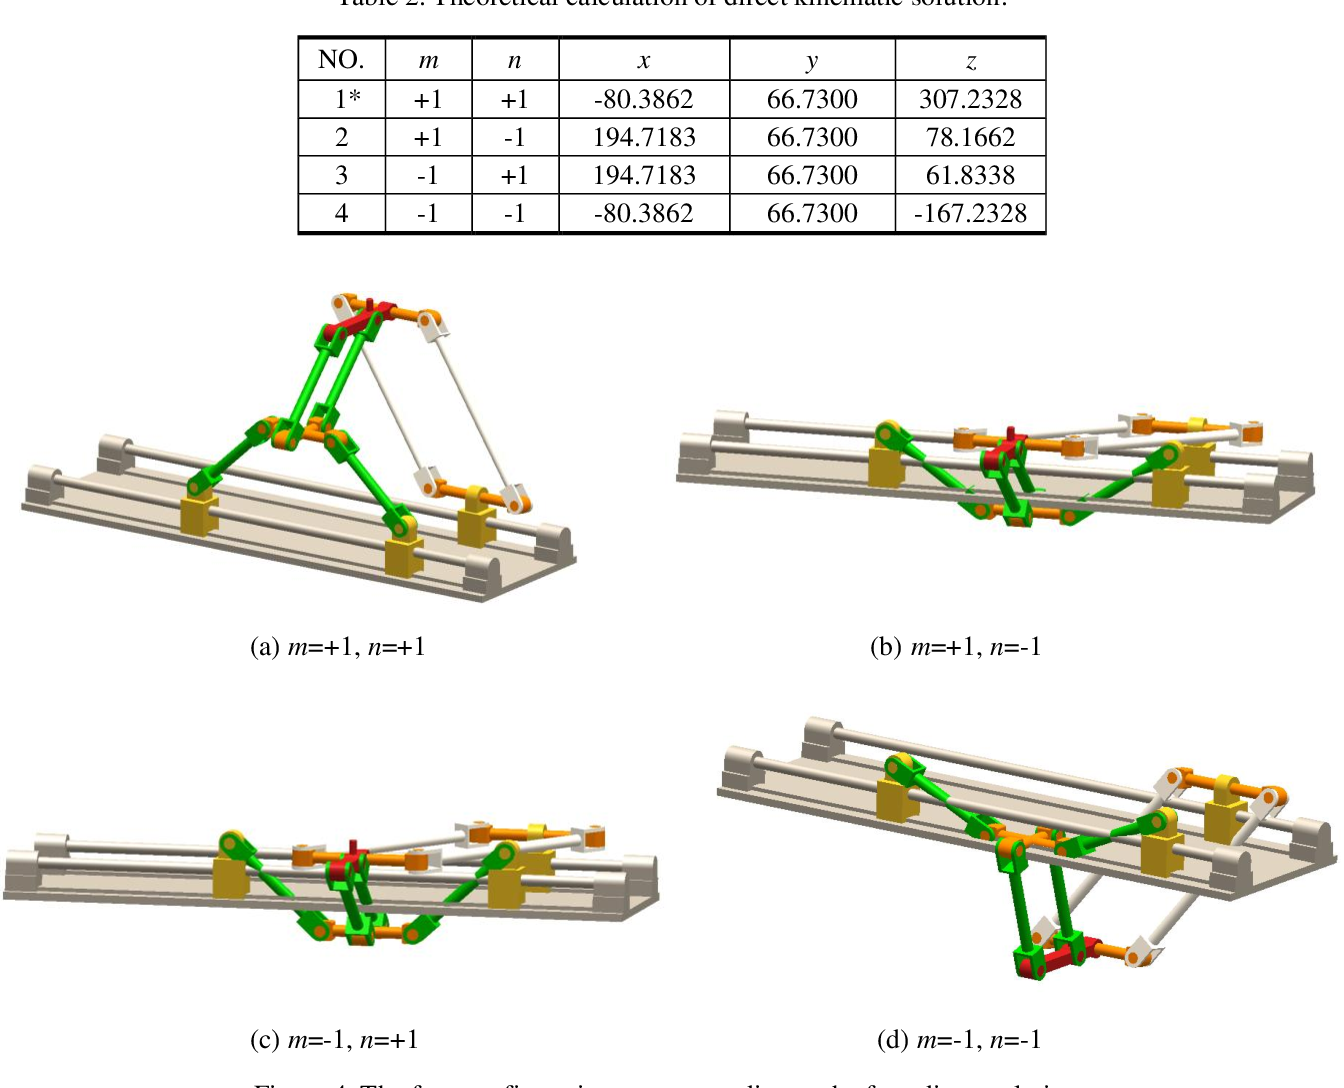 Figure 4 for A novel partially-decoupled translational parallel manipulator with symbolic kinematics, singularity identification and workspace determination